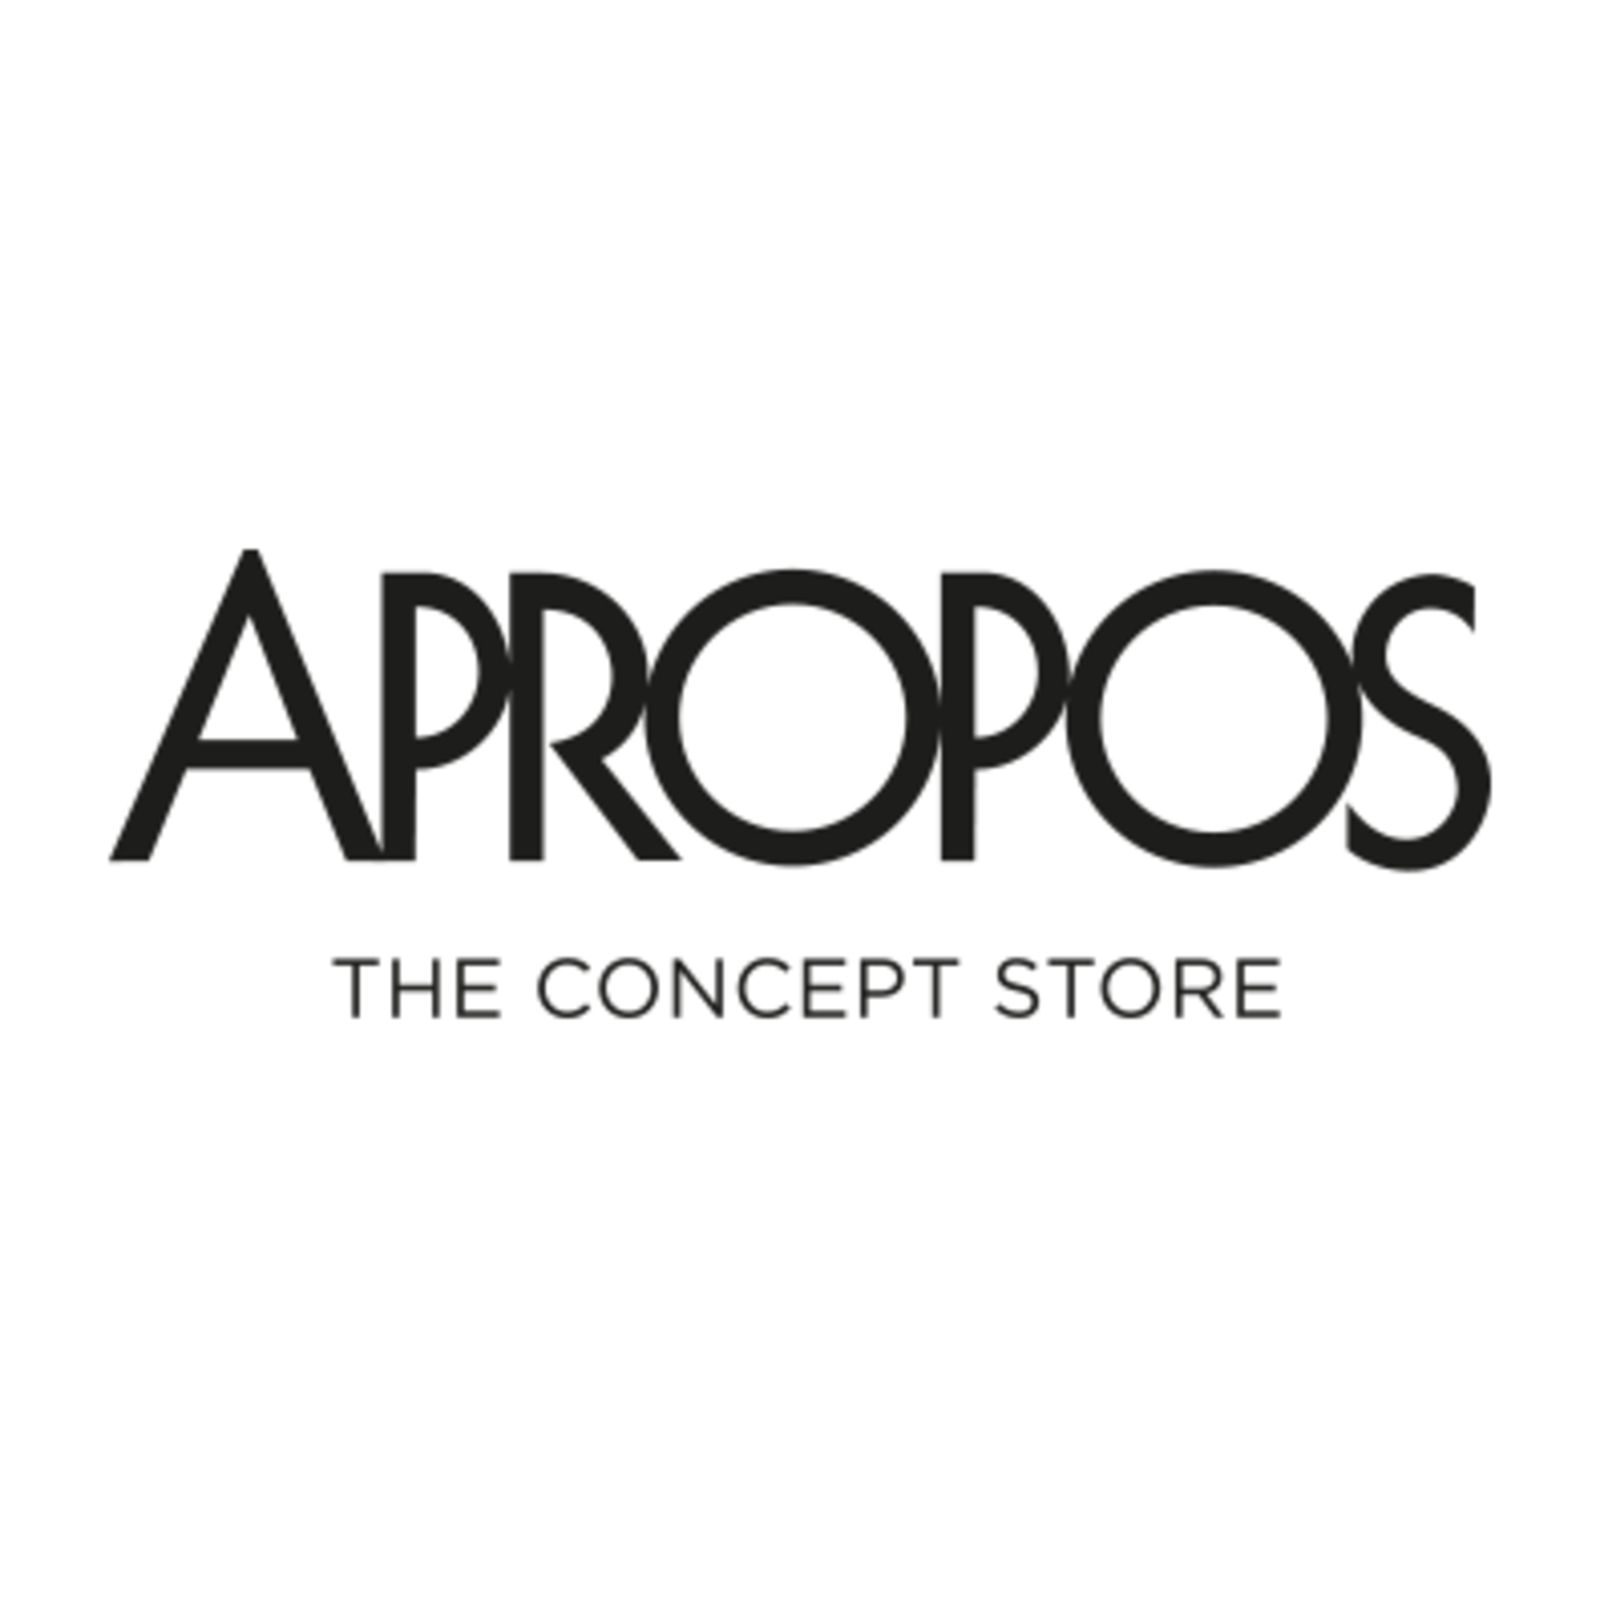 APROPOS The Concept Store in Hamburg (Bild 1)